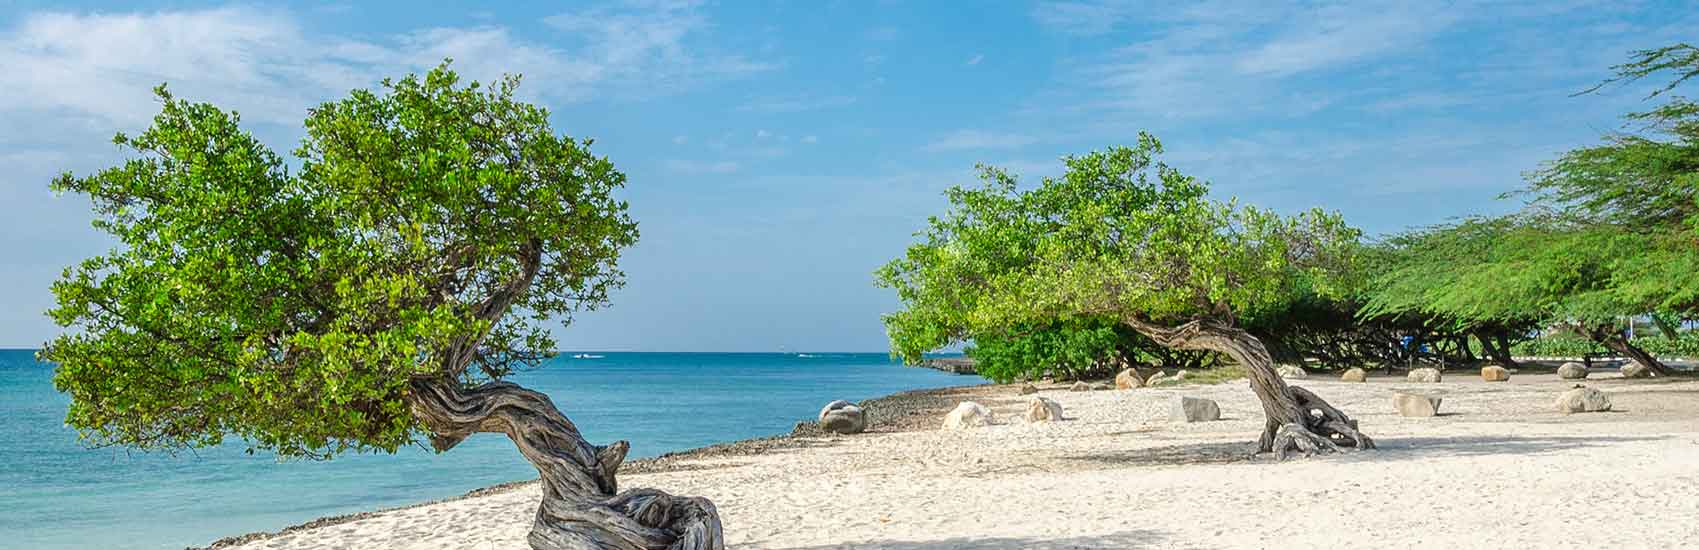 Regent Seven Seas Cruises 2021 World Cruise